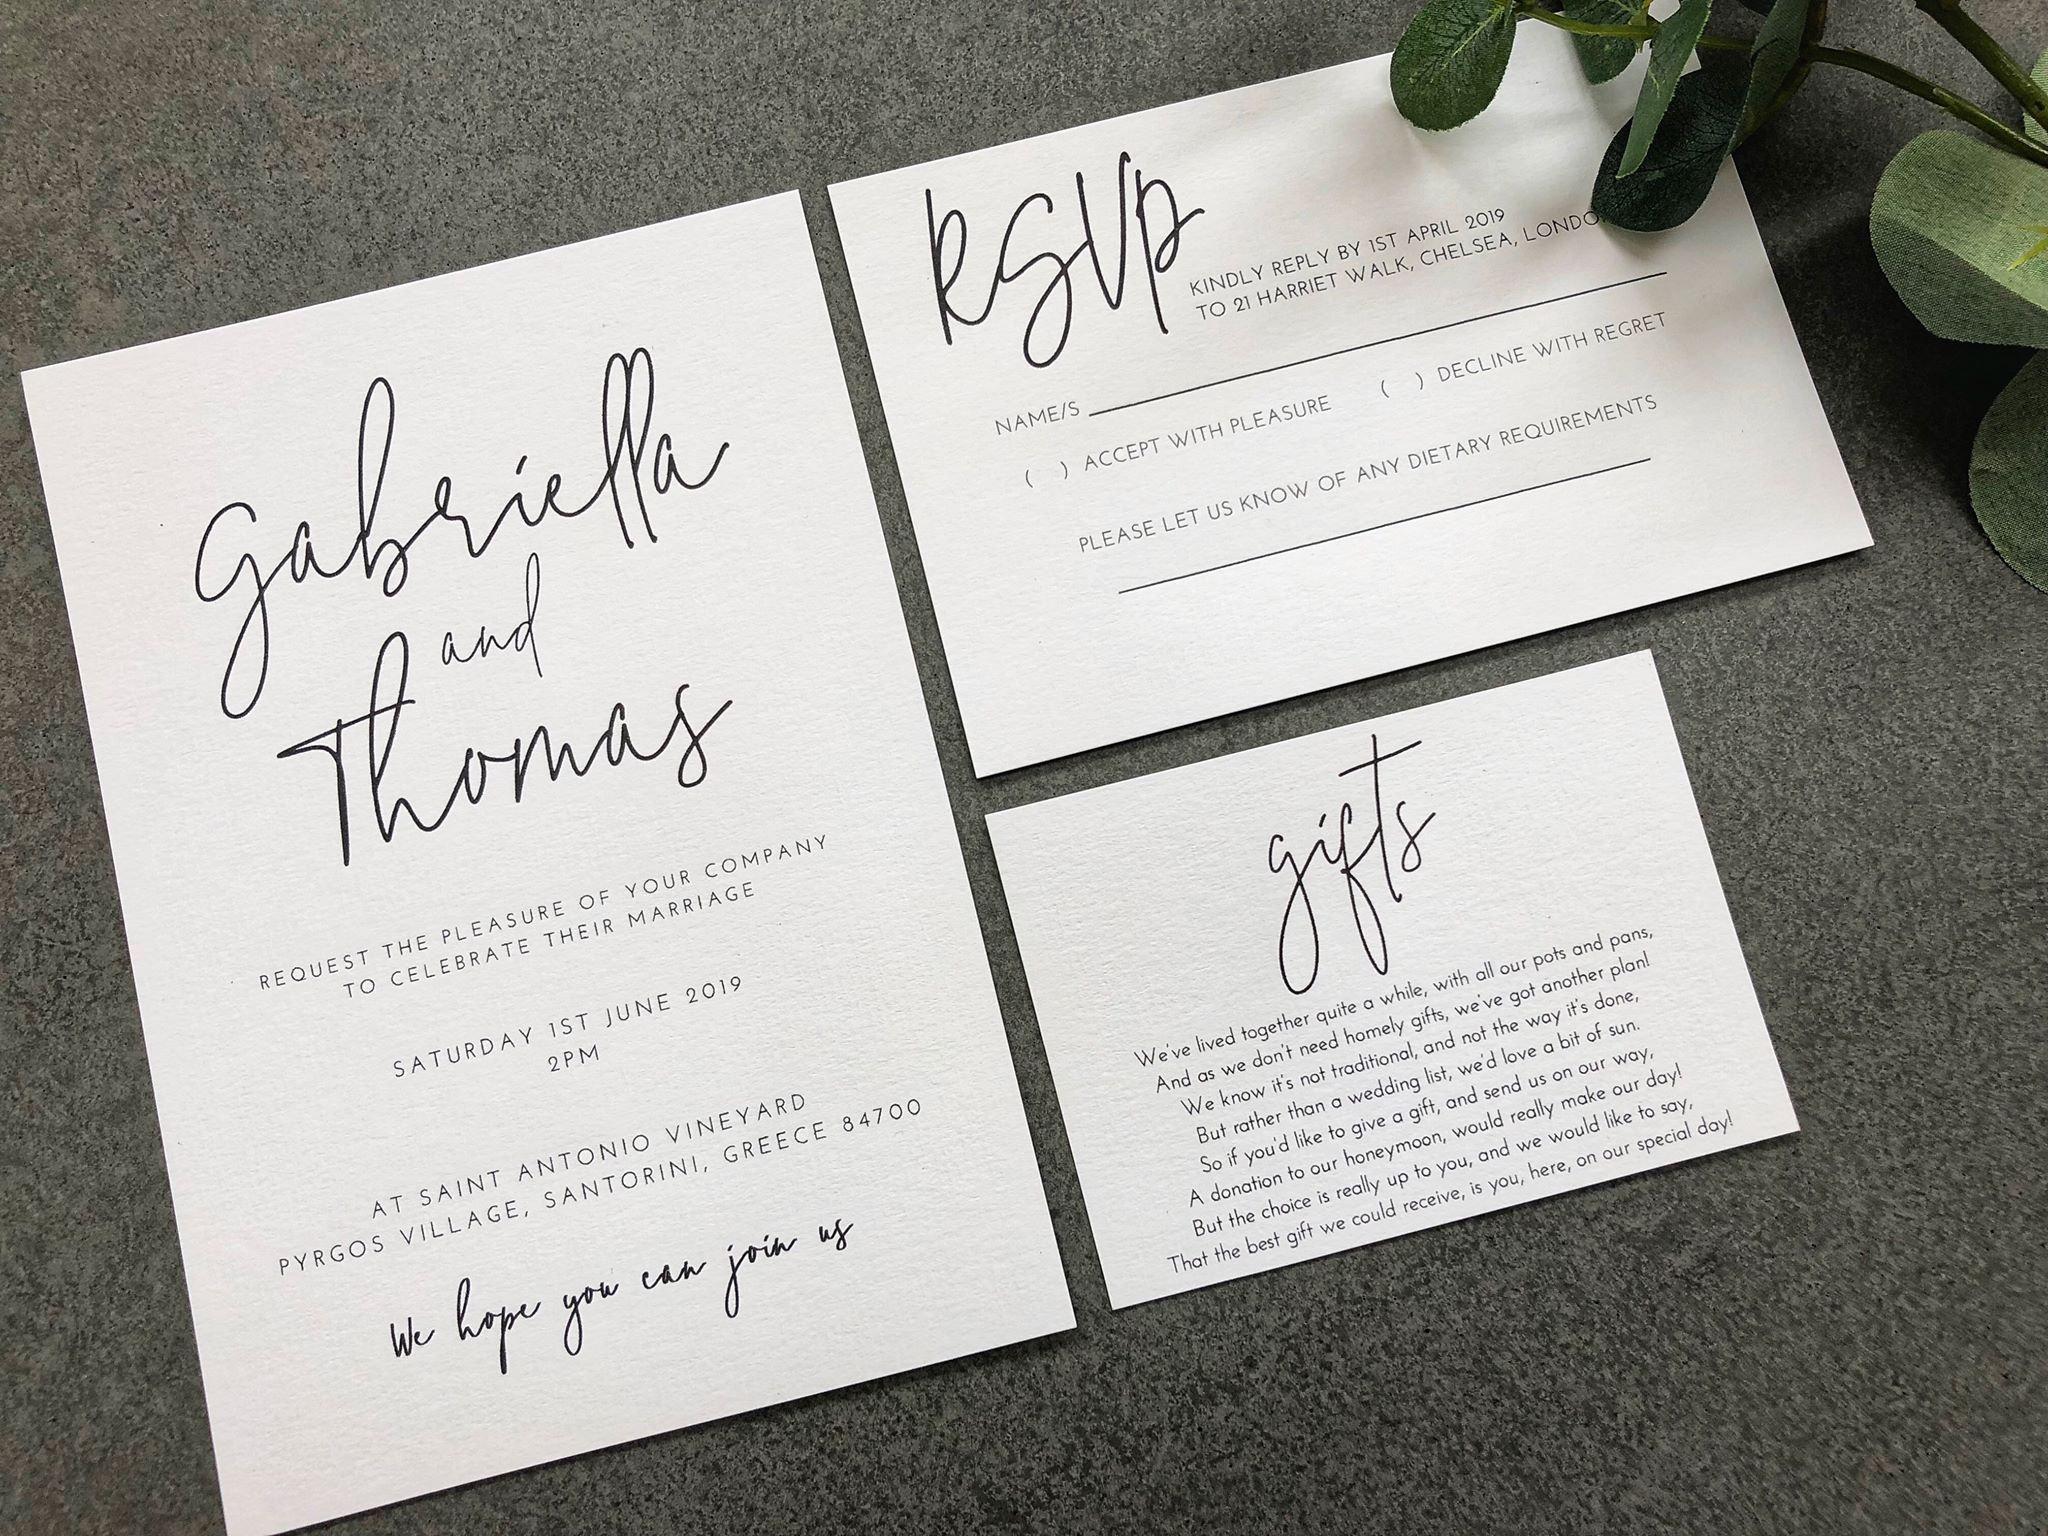 Modern Wedding Invites Uk: Gabriella Modern Calligraphy Style Wedding Invitation